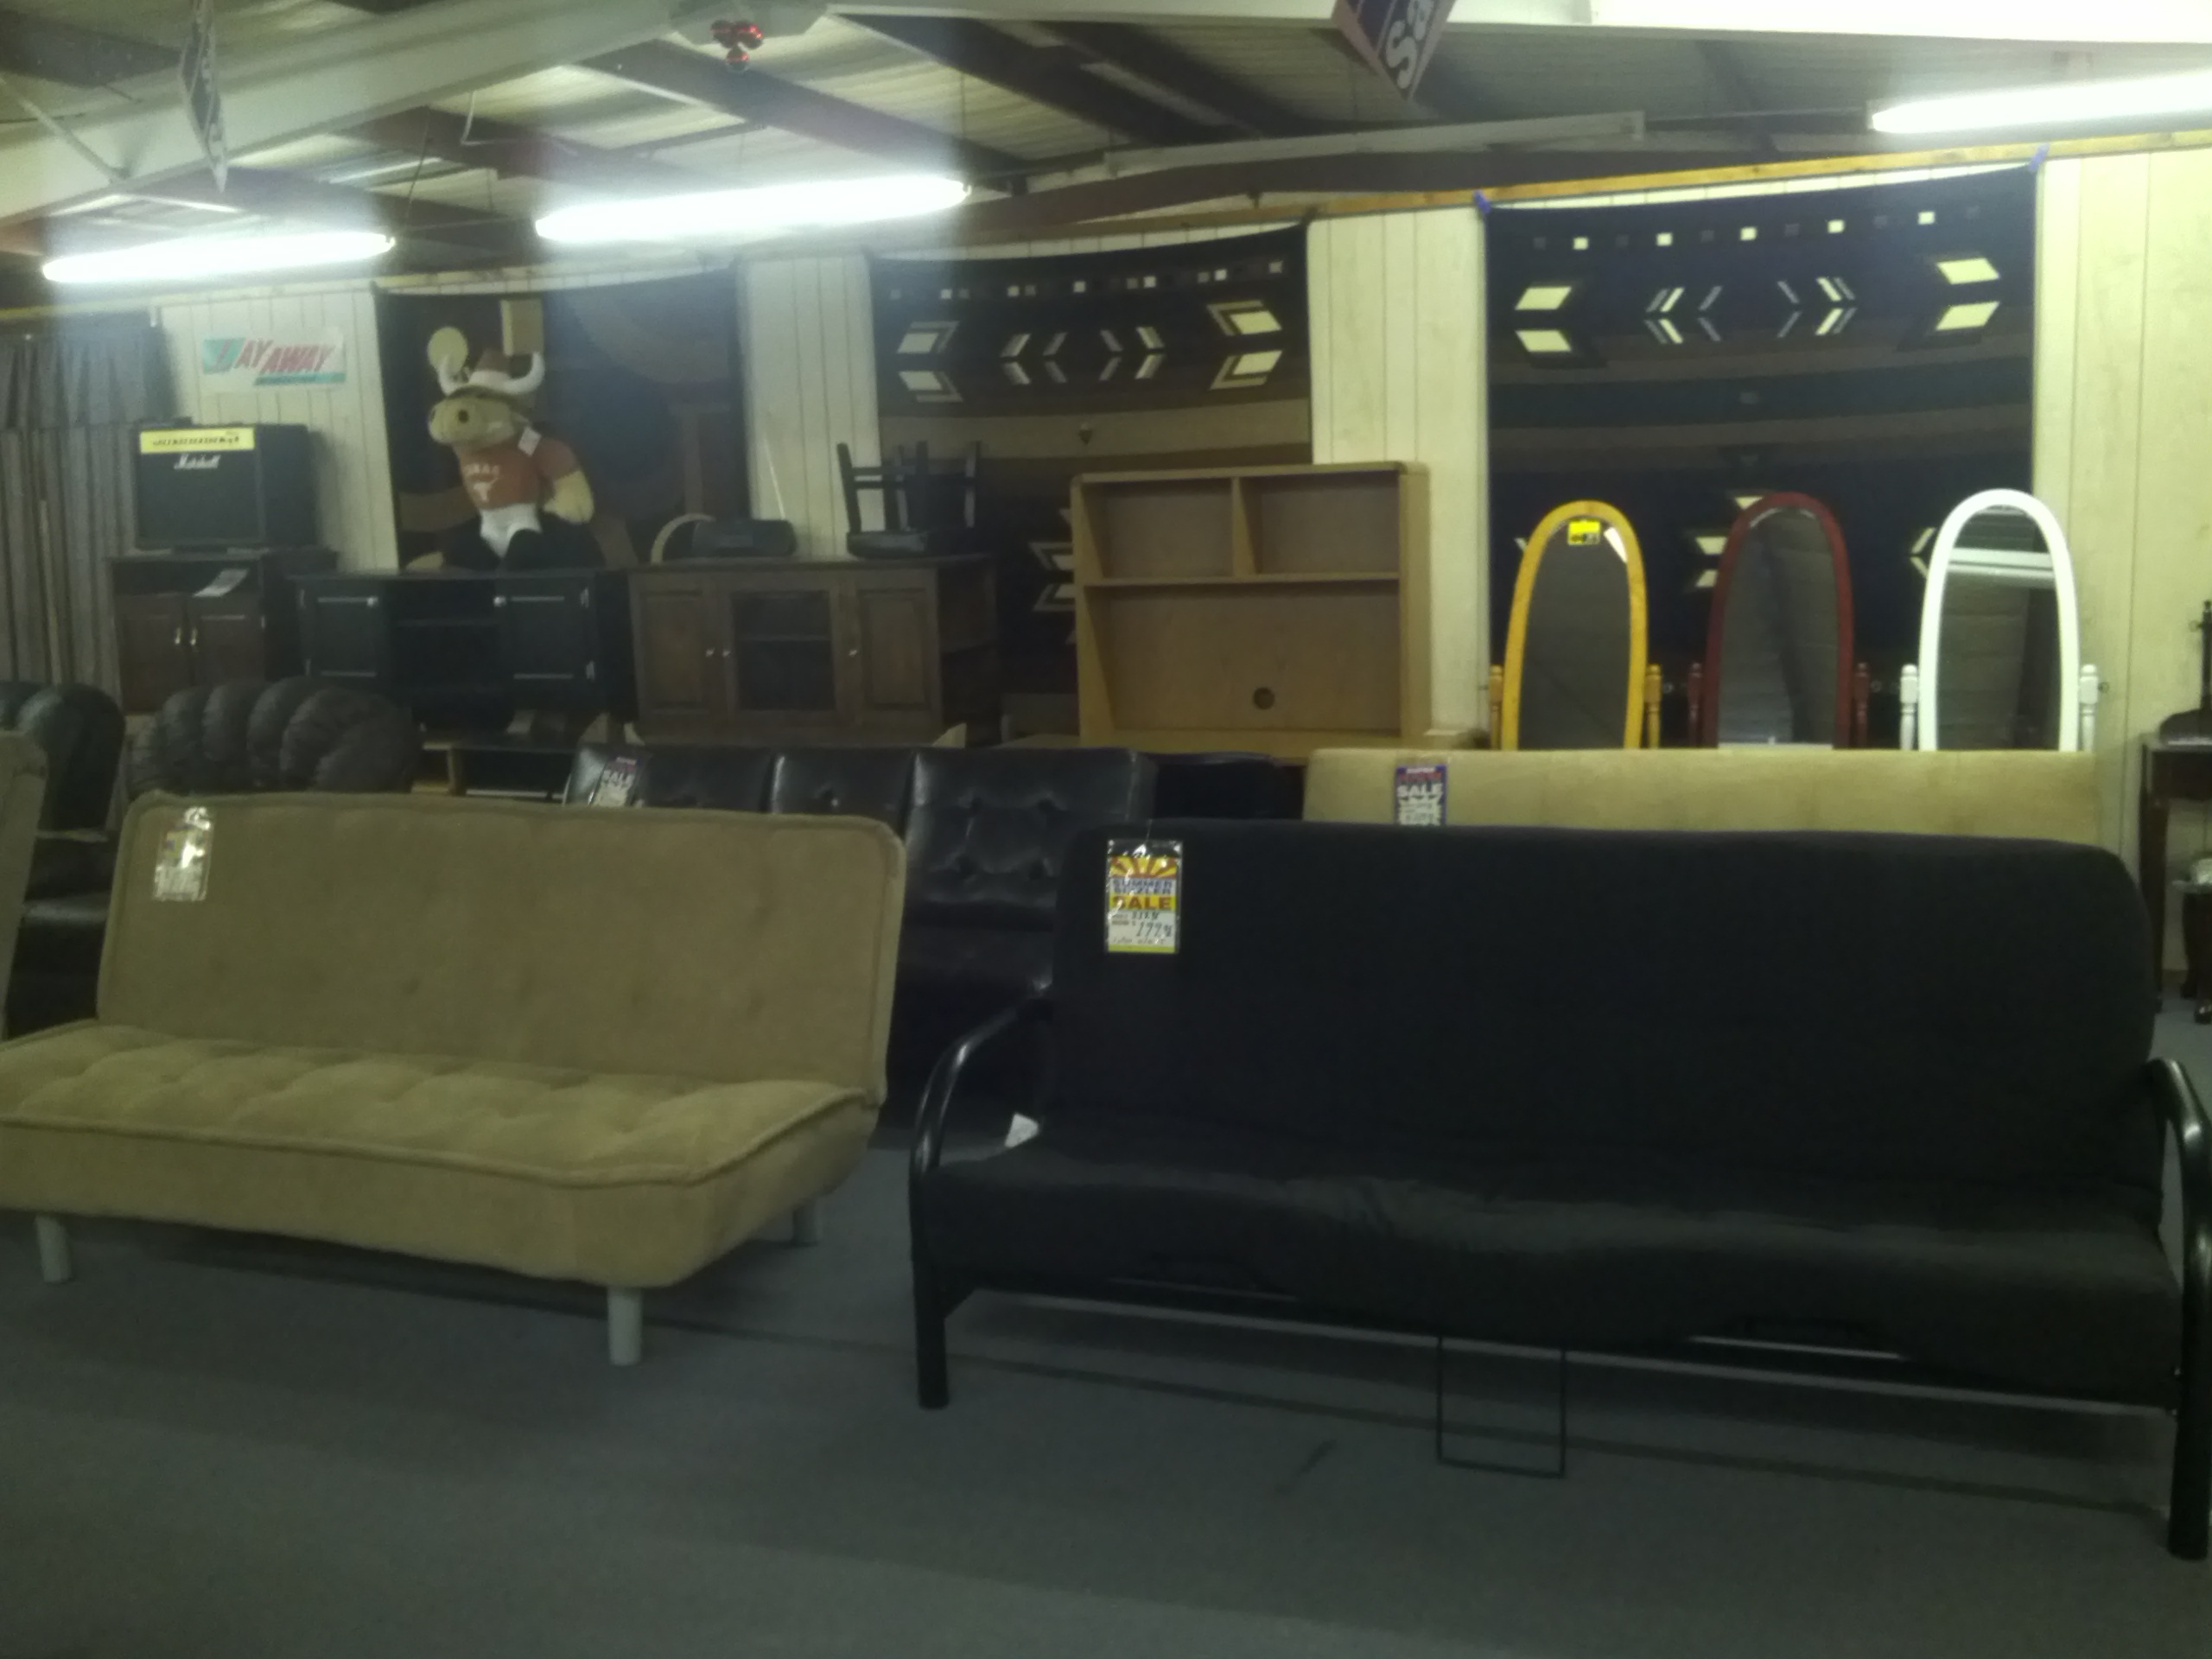 Centex Furniture In San Marcos Tx 512 392 2